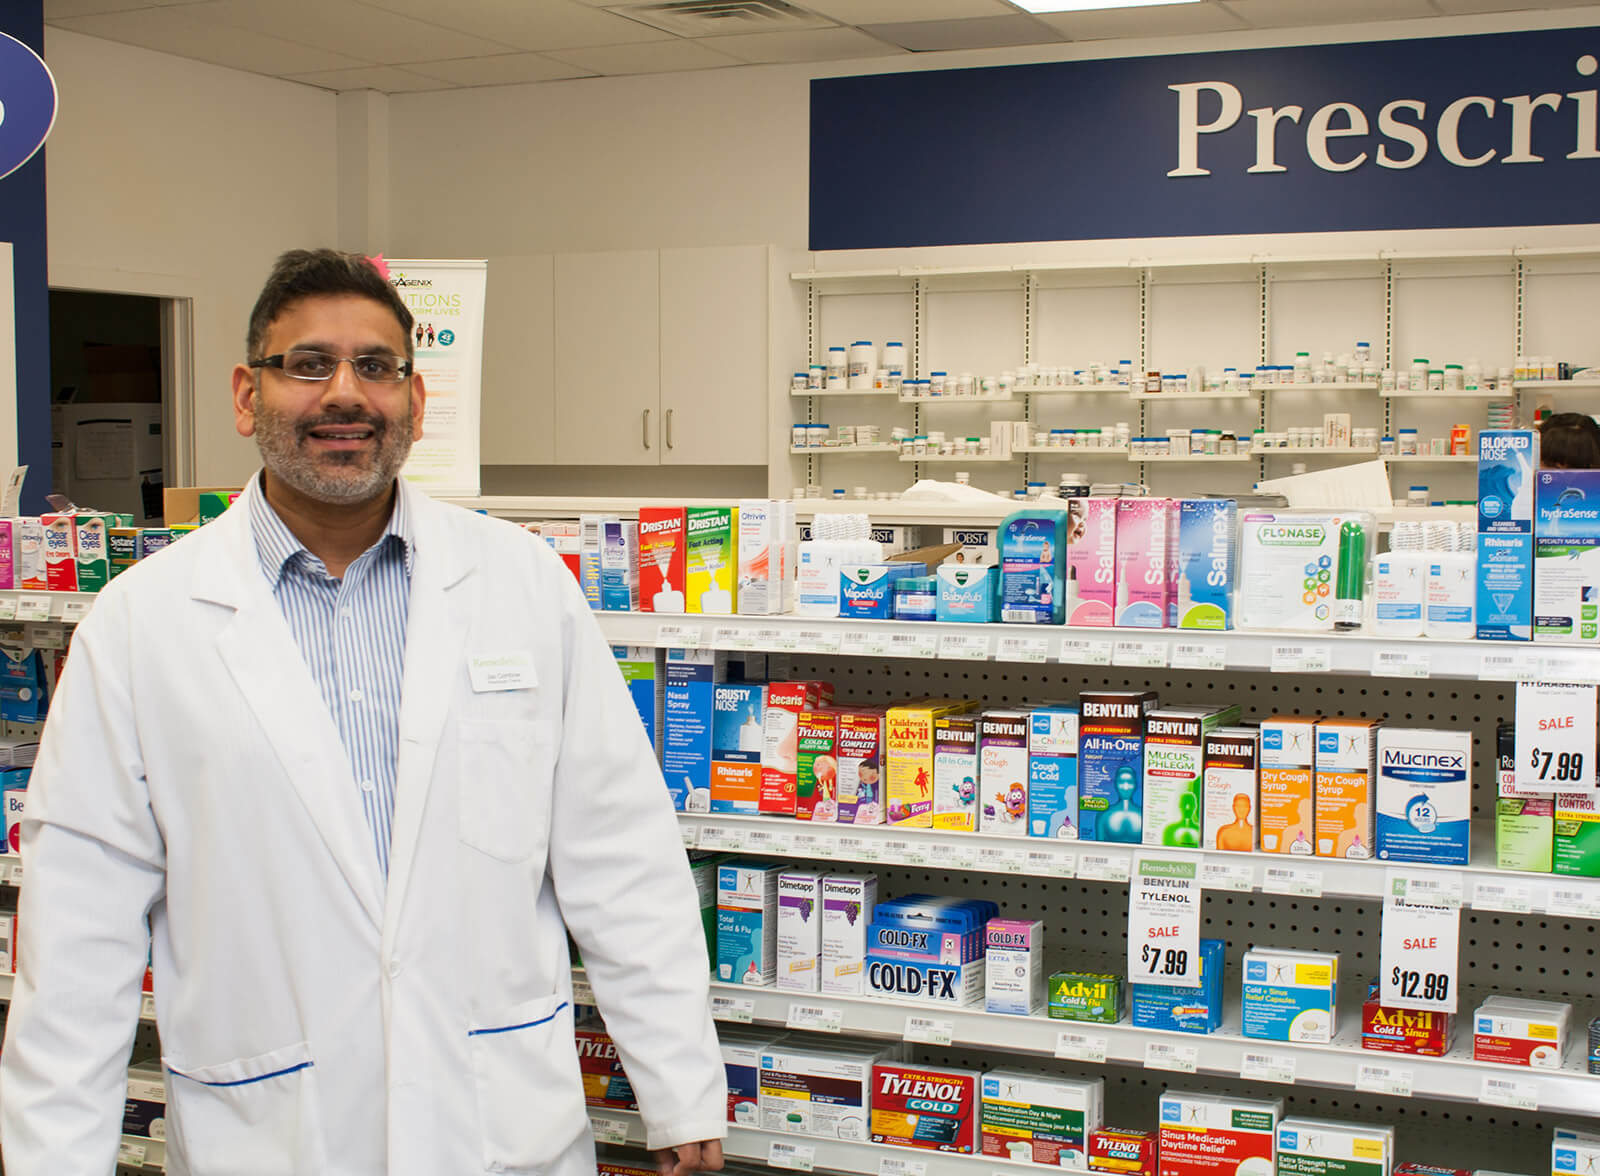 Hi, I am Jas Combow Owner/pharmacist at Harmony Valley Pharmacy